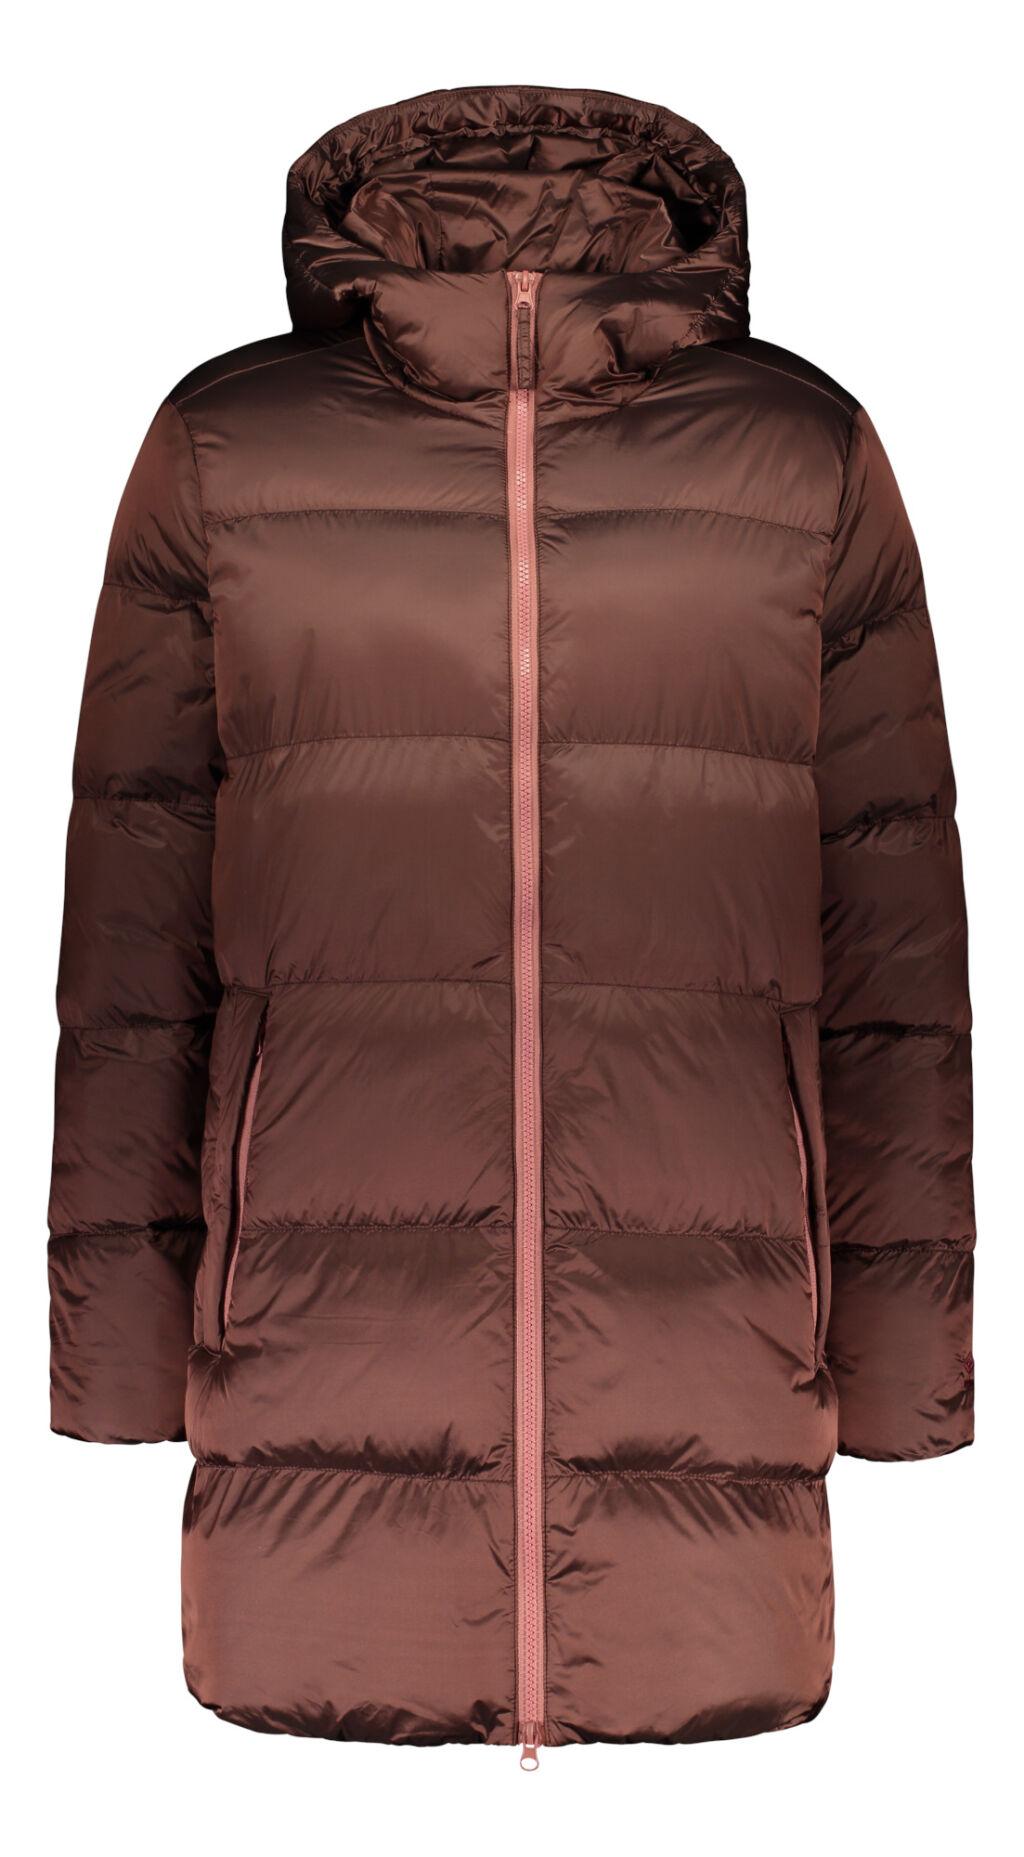 Umbro Freya puffa jacket wNaisten vanutakki